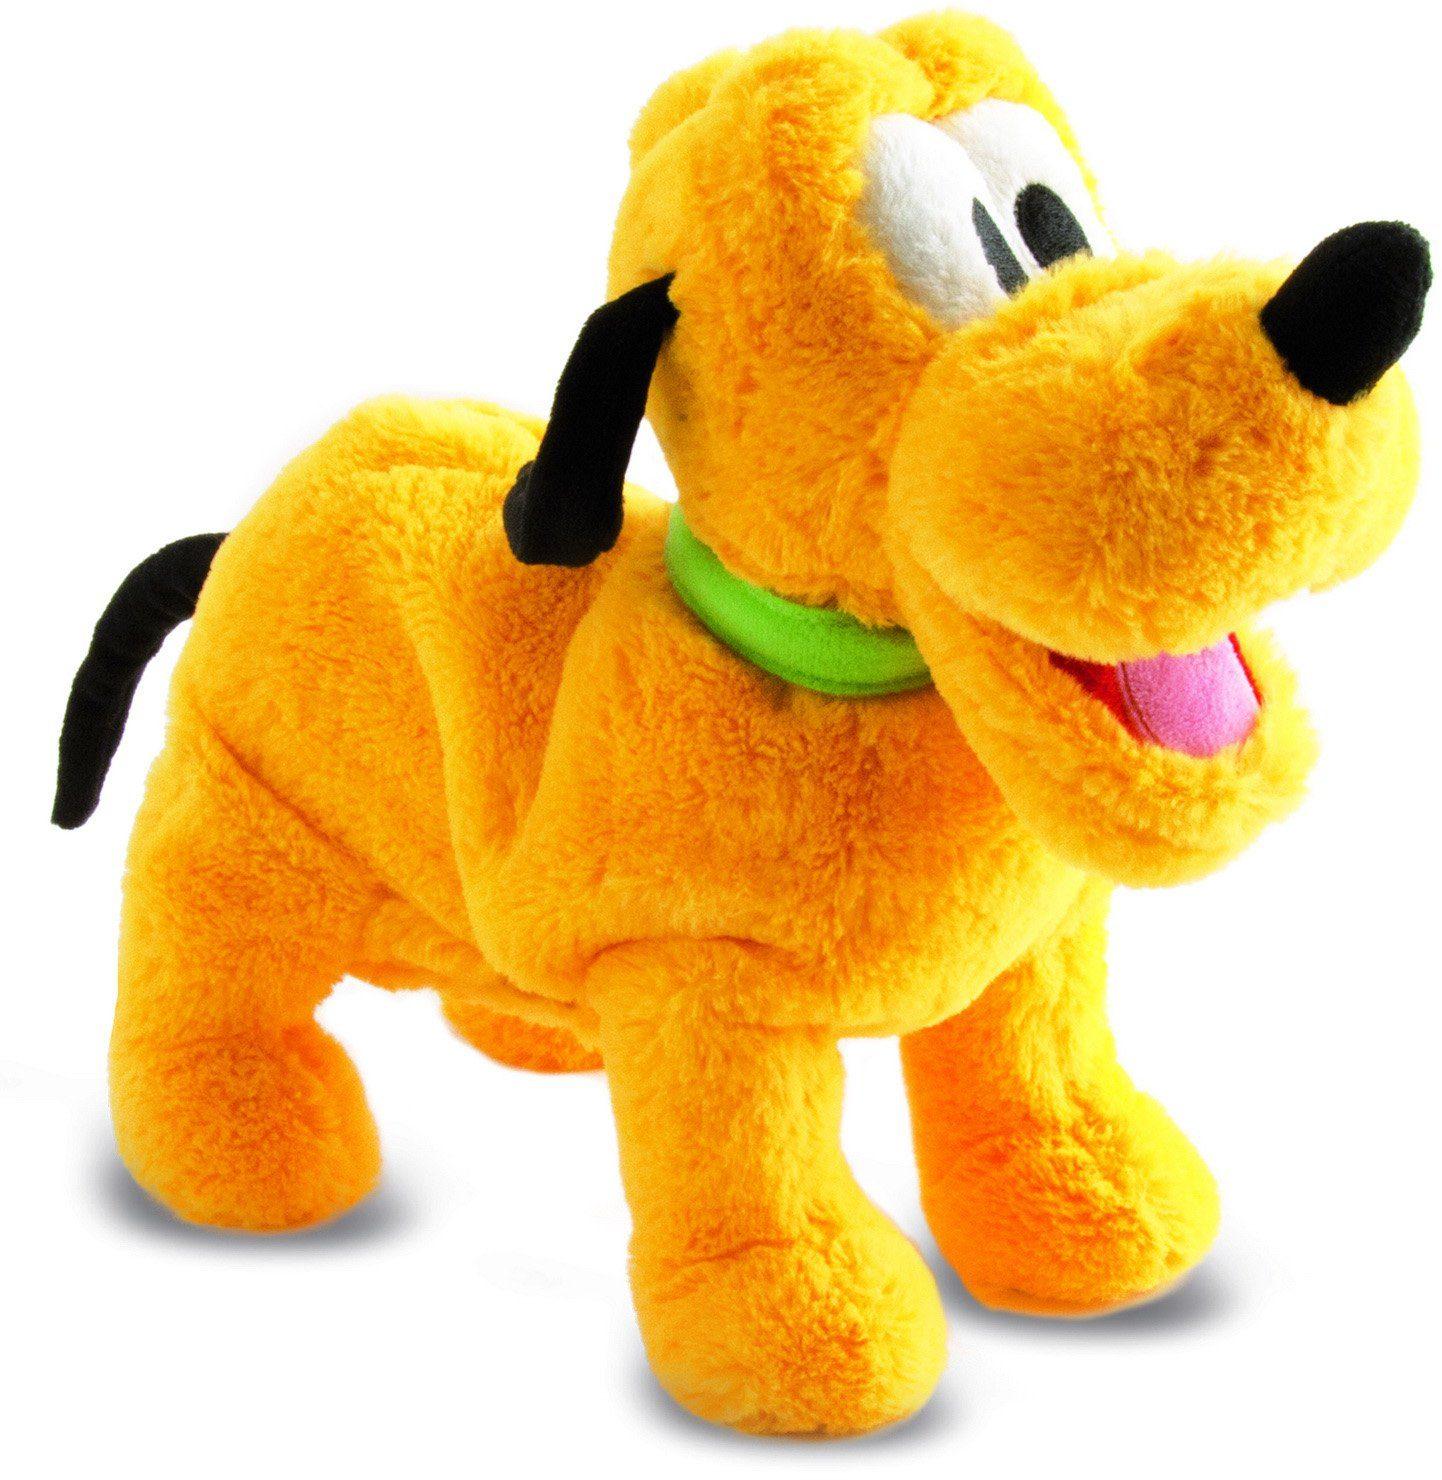 IMC Toys Plüschtier mit Funktion, »Club Petz Funny Pluto«